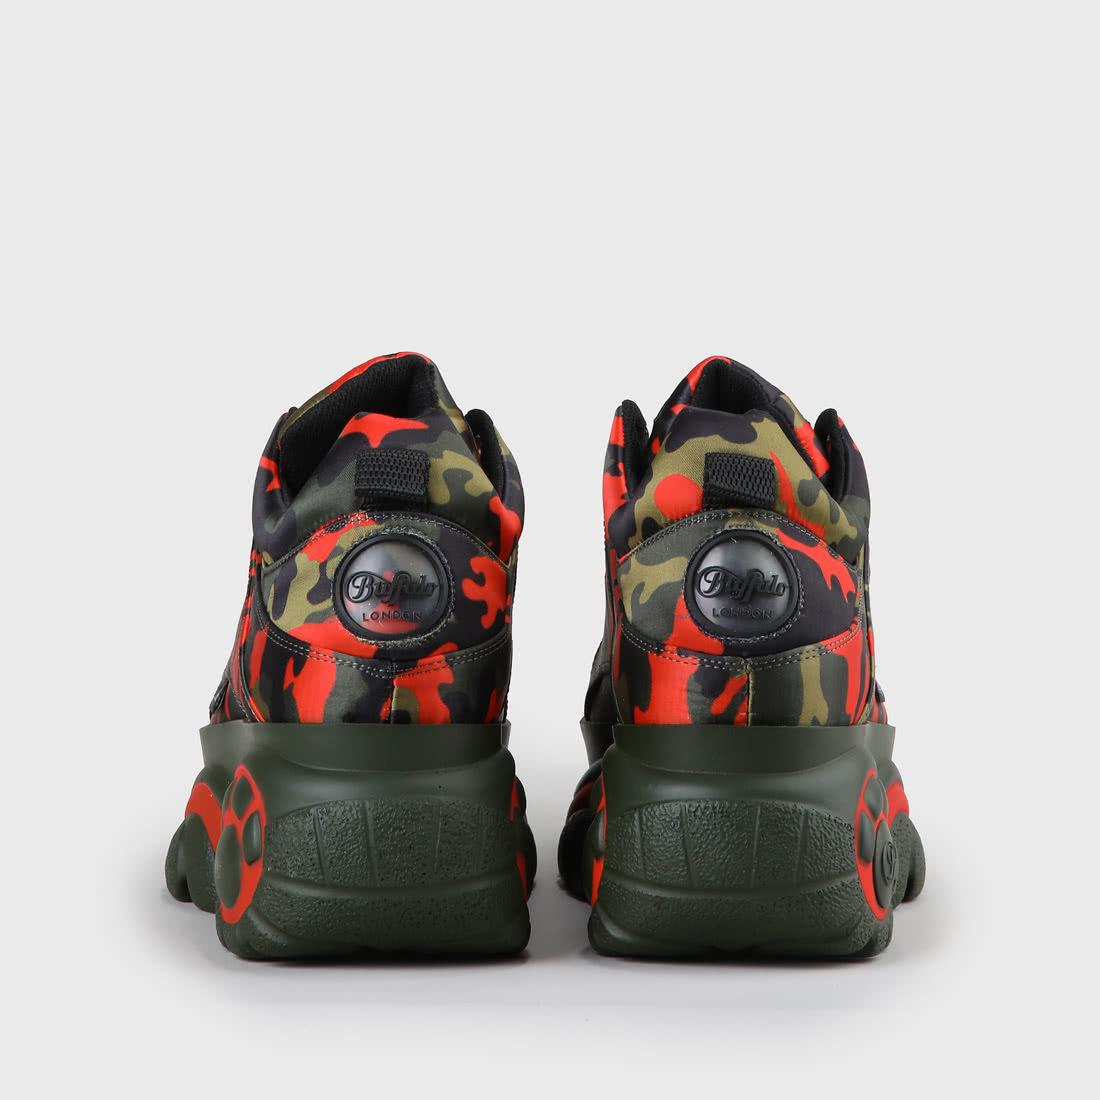 on sale bf437 3ce23 Buffalo Classic Plateau-Sneaker Nylon Camouflage